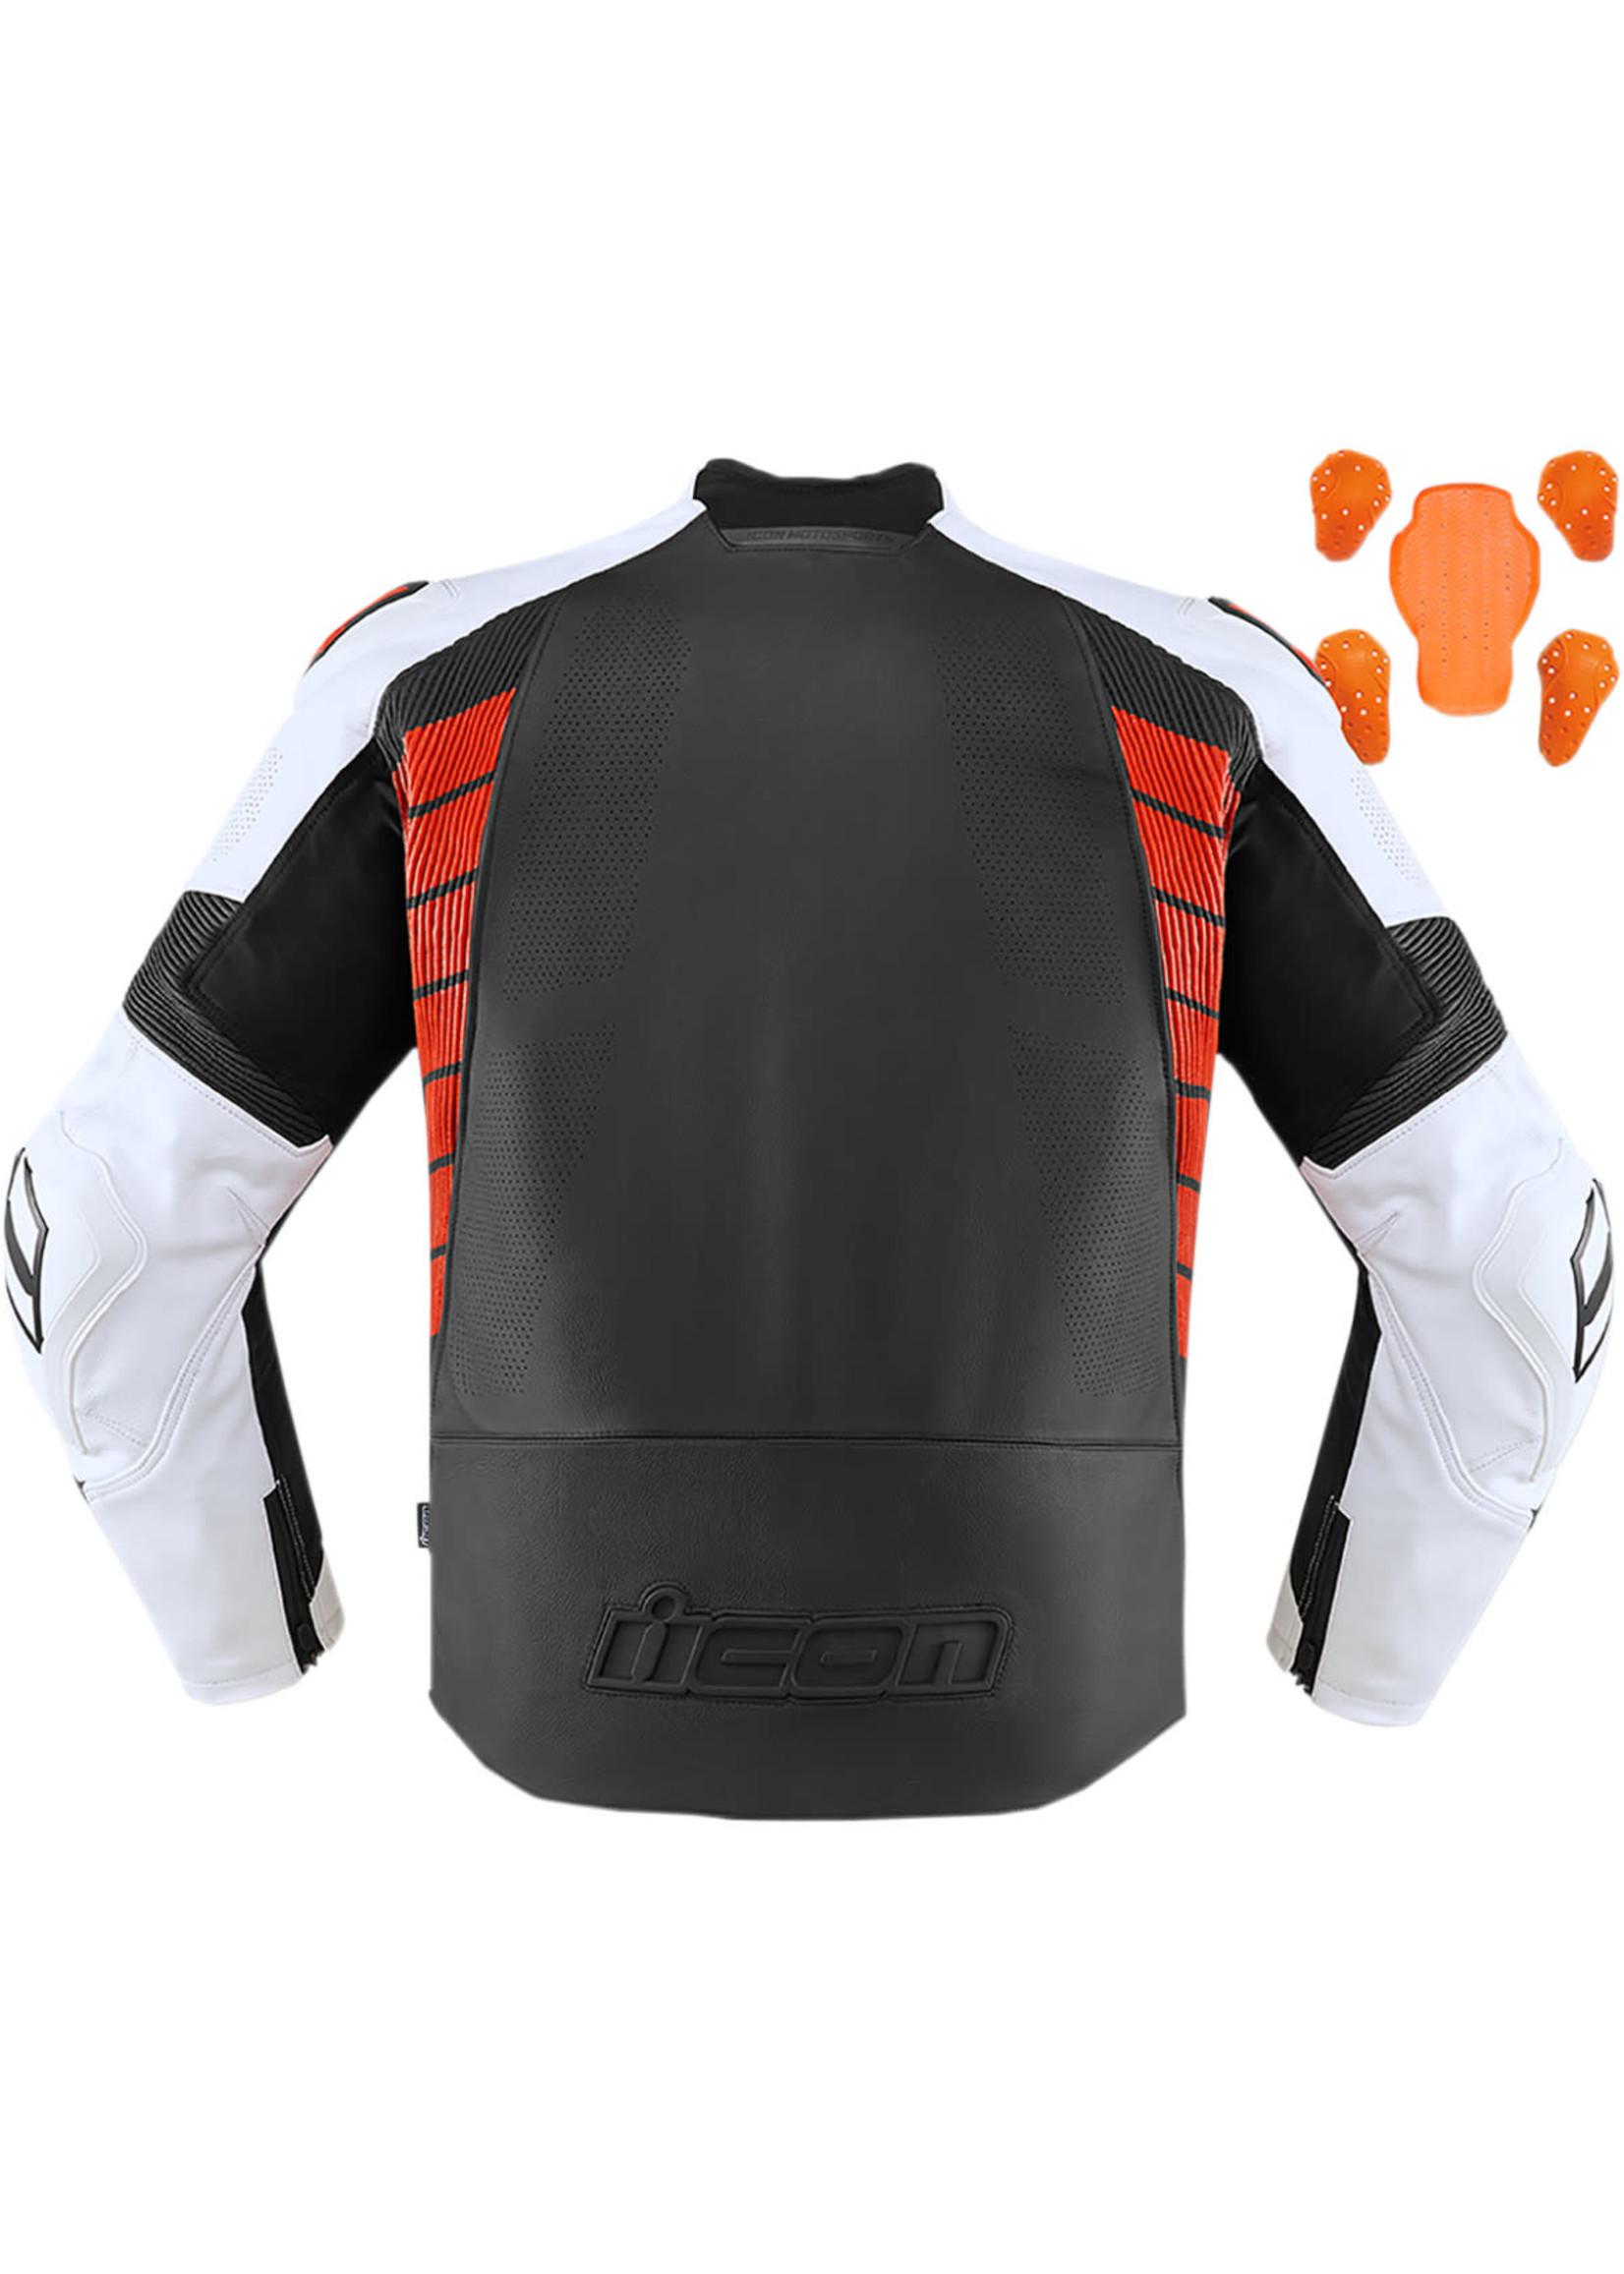 ICON ICON Hypersport 2 Prime™ Jacket